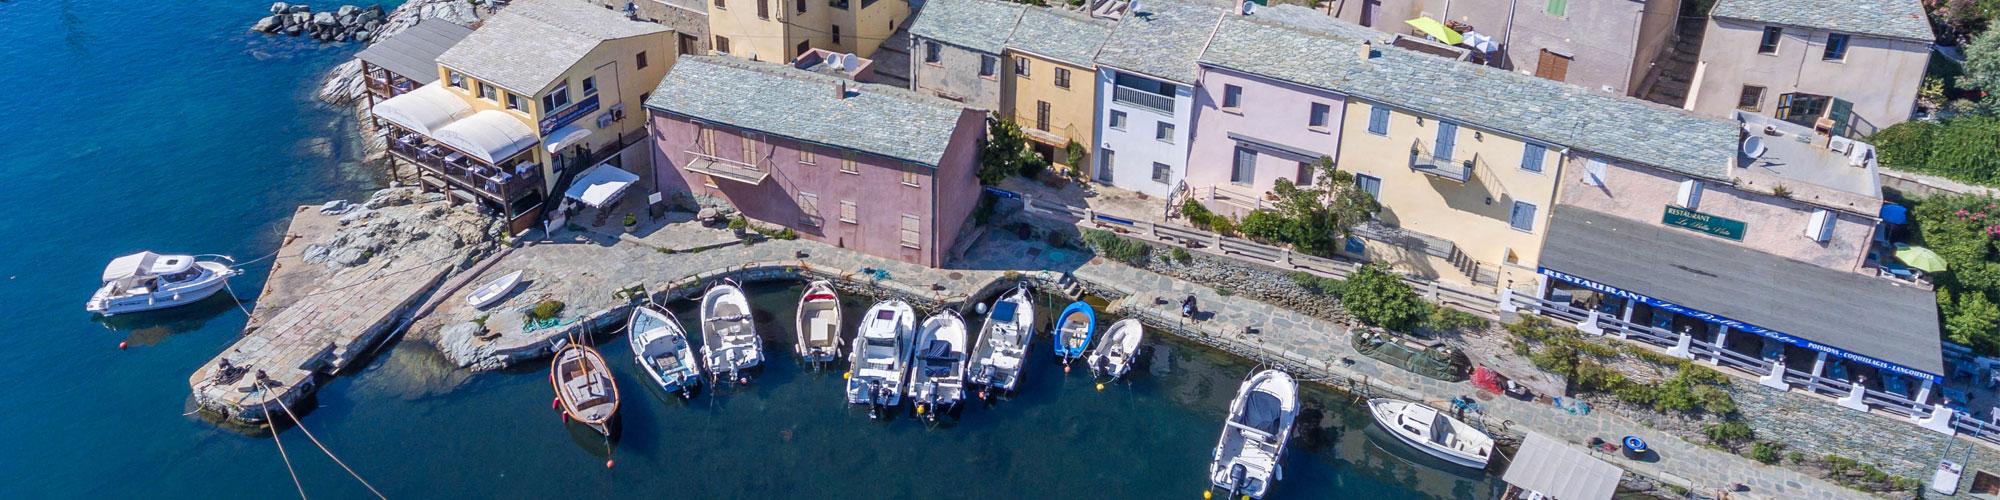 Paradisu - Korsika - Corse - Centuri